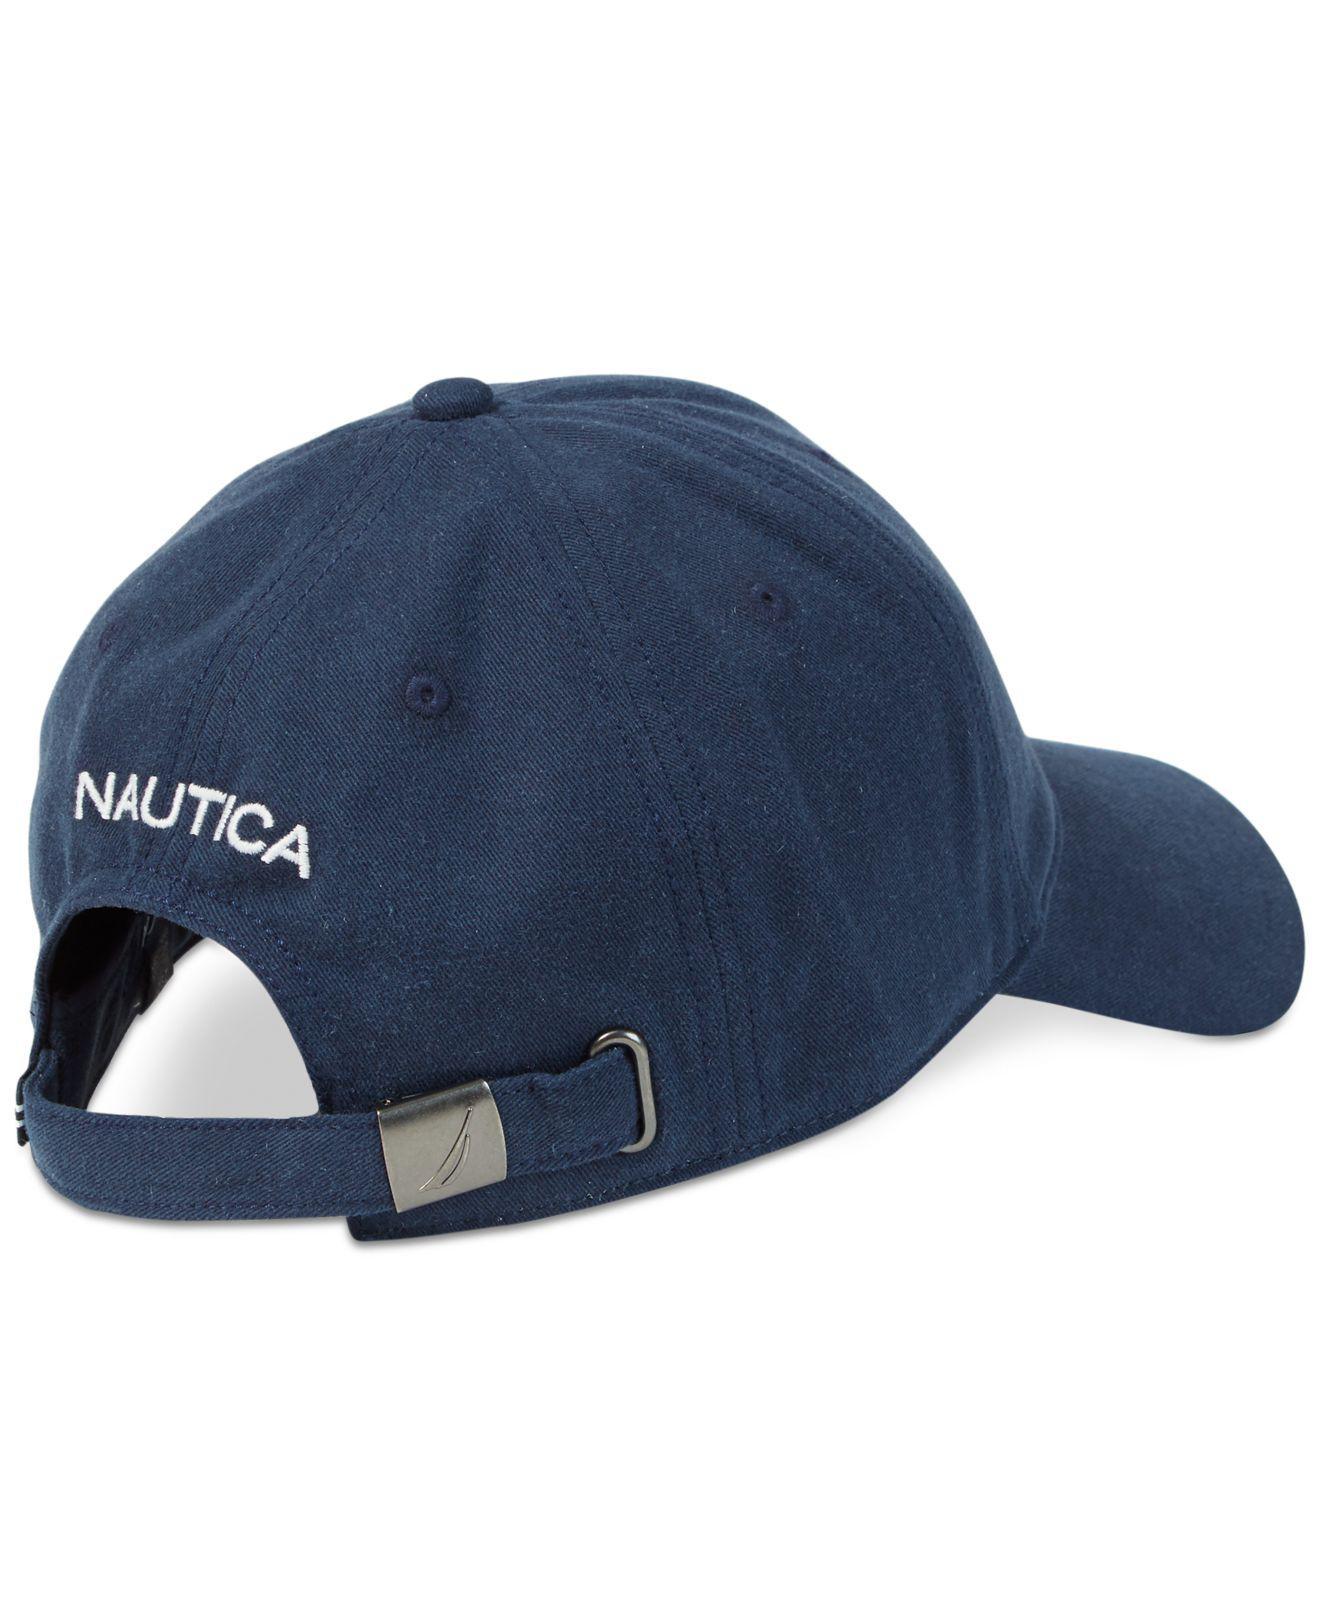 30bcfb3442f00d Lyst - Nautica Logo Baseball Cap in Blue for Men